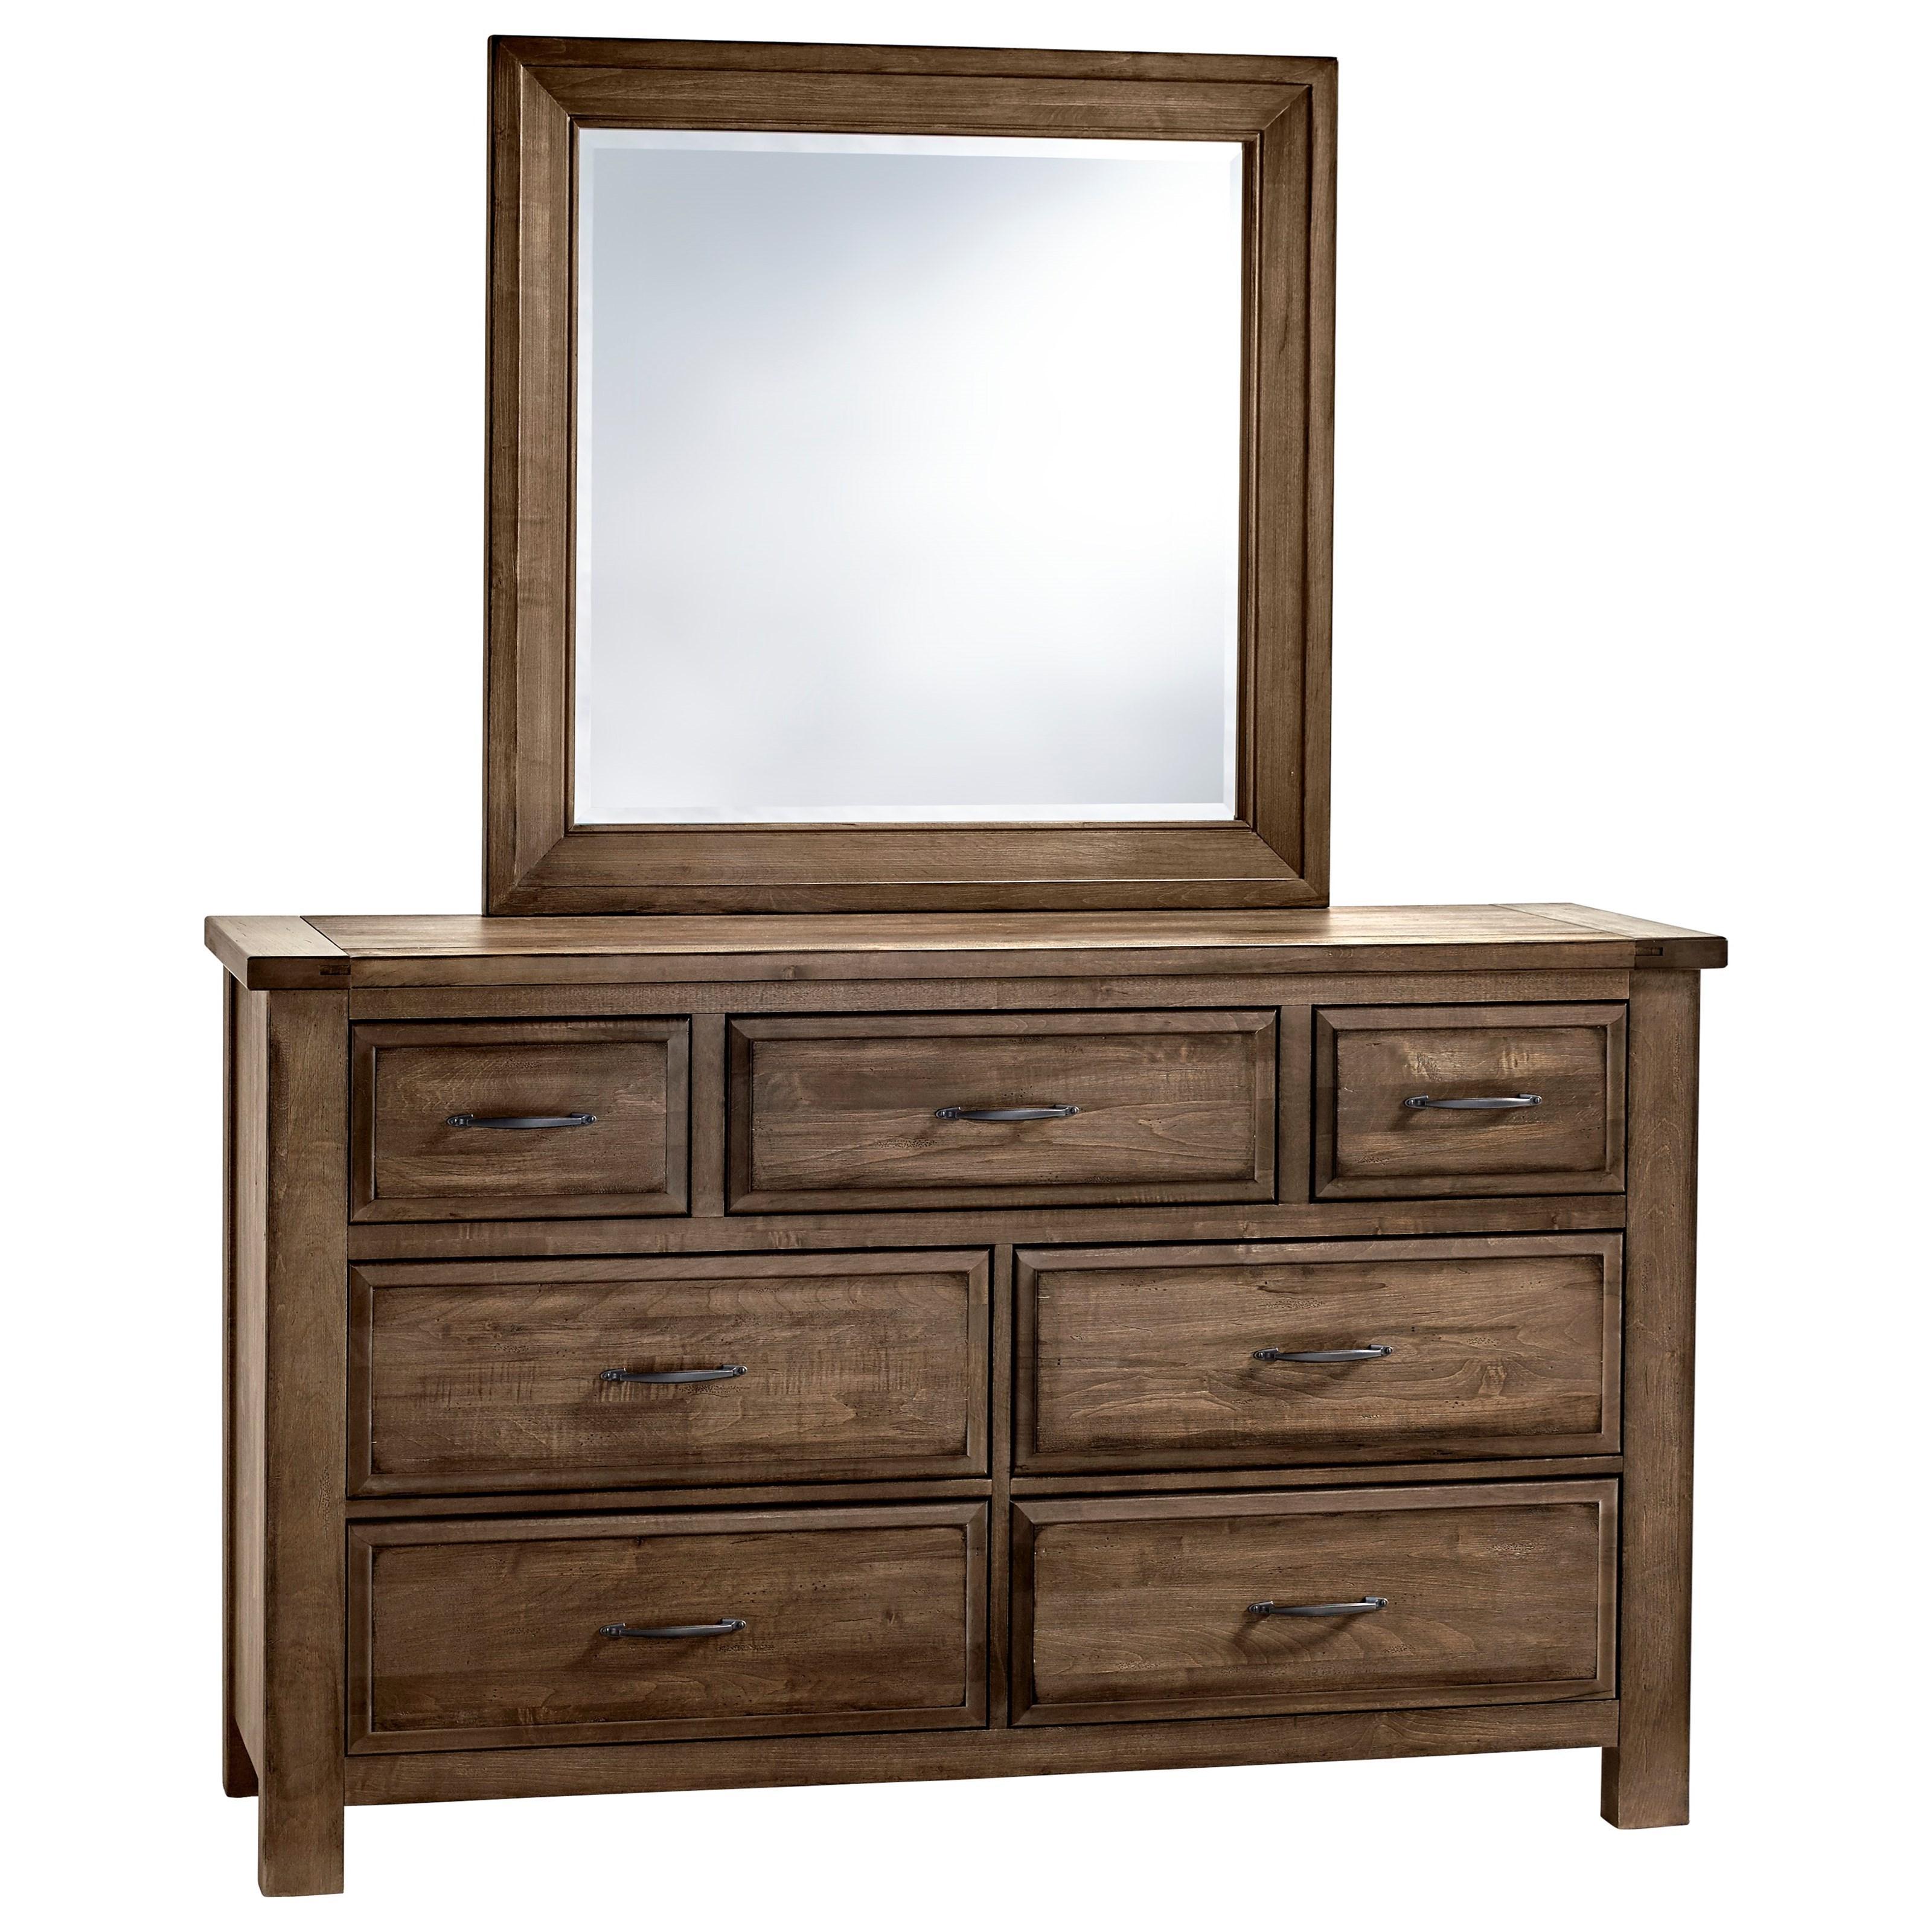 Artisan & Post Maple Road Dresser & Mirror - Item Number: 117-003+446